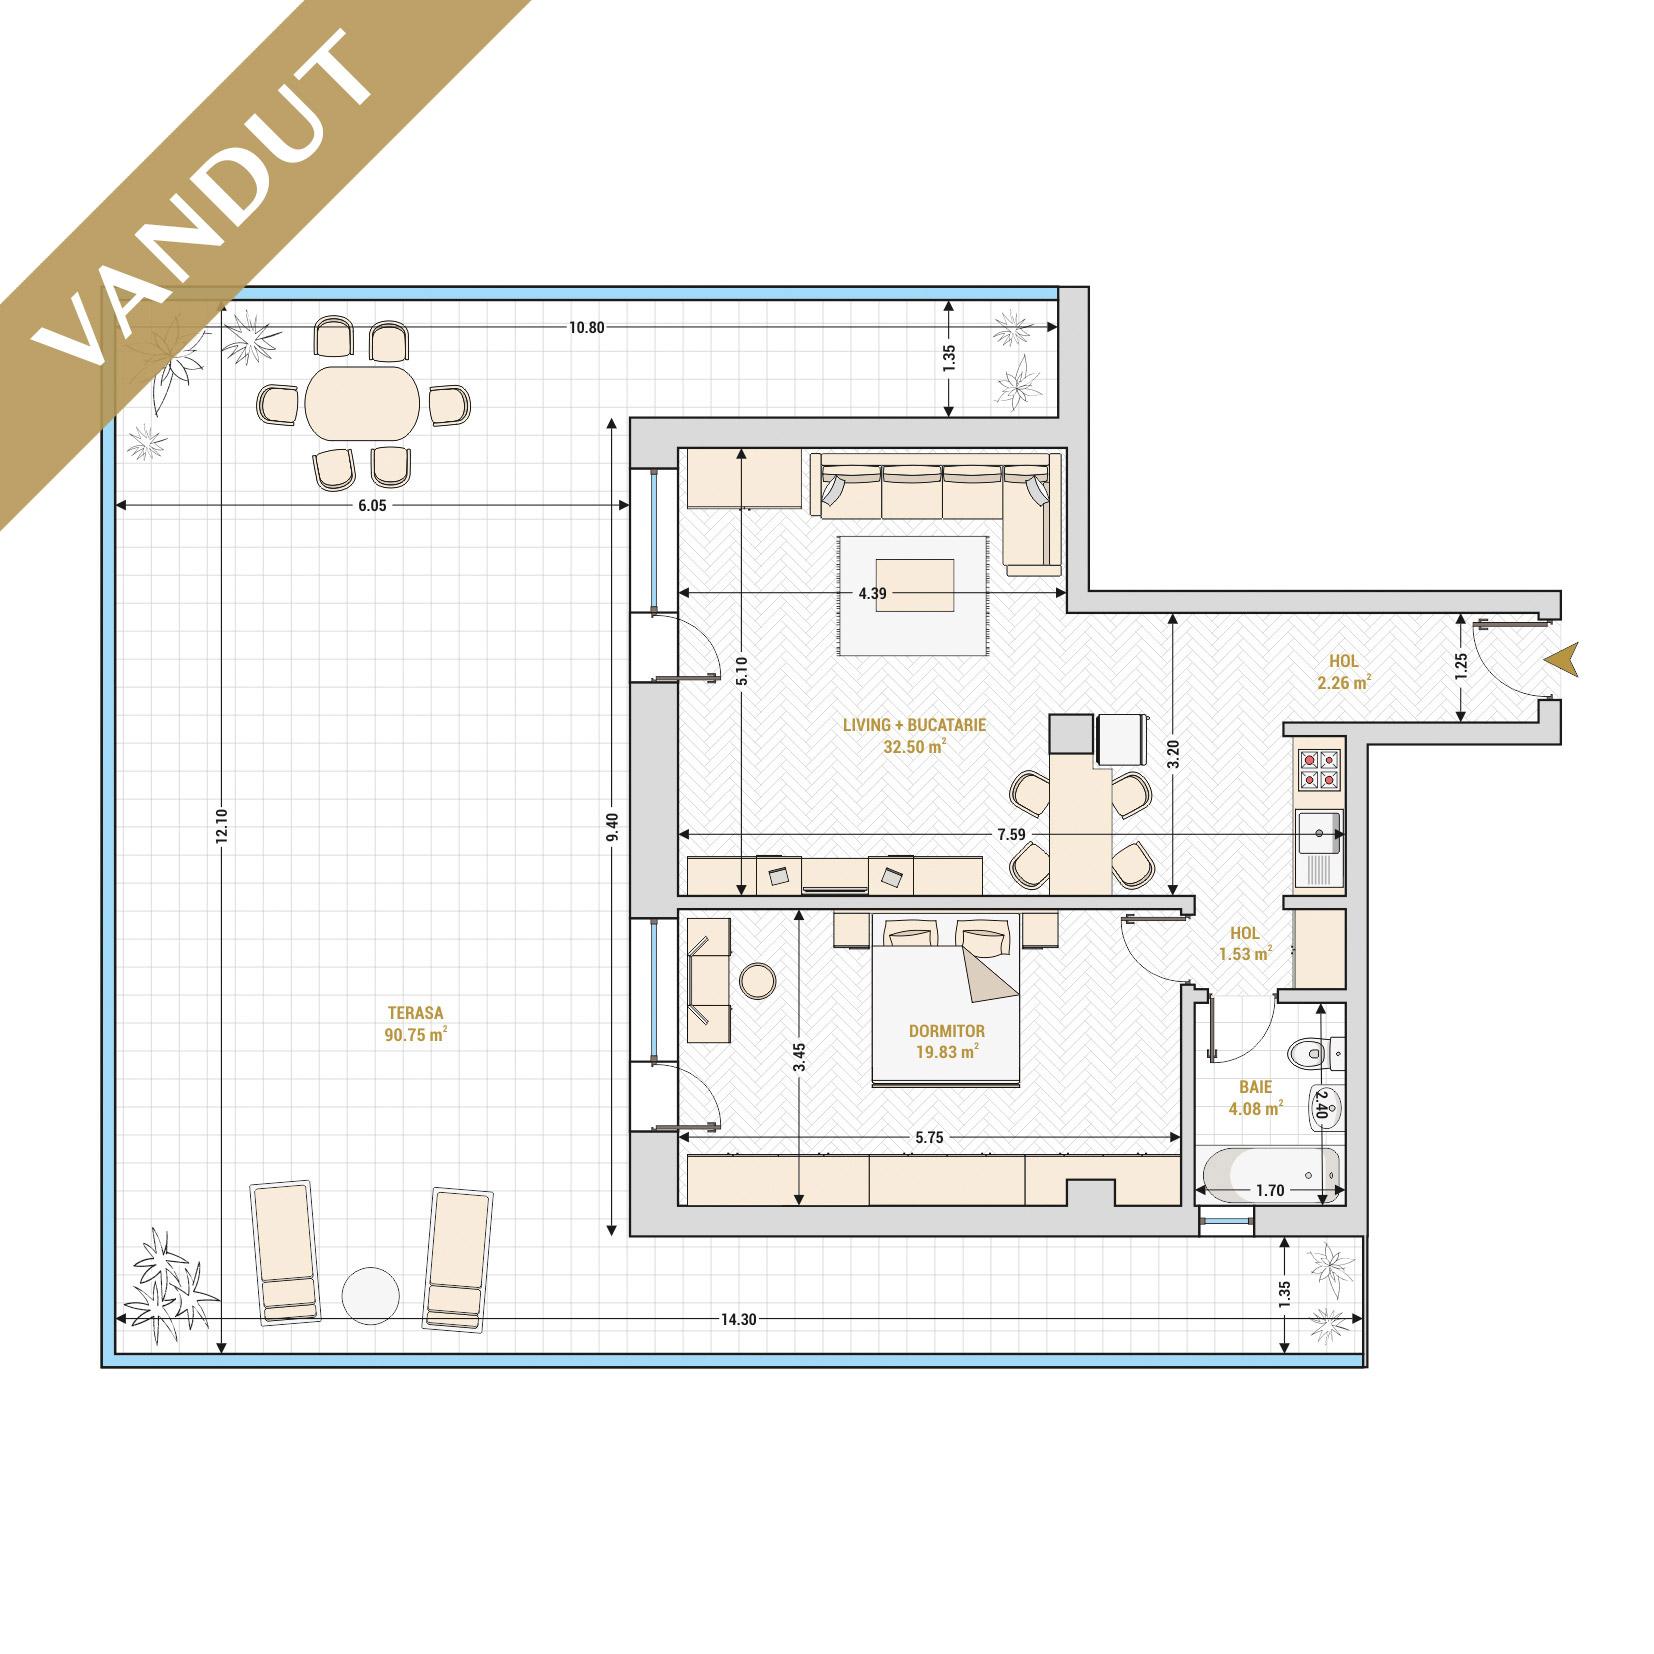 Apartament 2 camere de vanzare Bucuresti - Catedral Residence - Marriott, Piata Unirii, 13 Septembrie, Izvor - Tip 9 - T1 - V